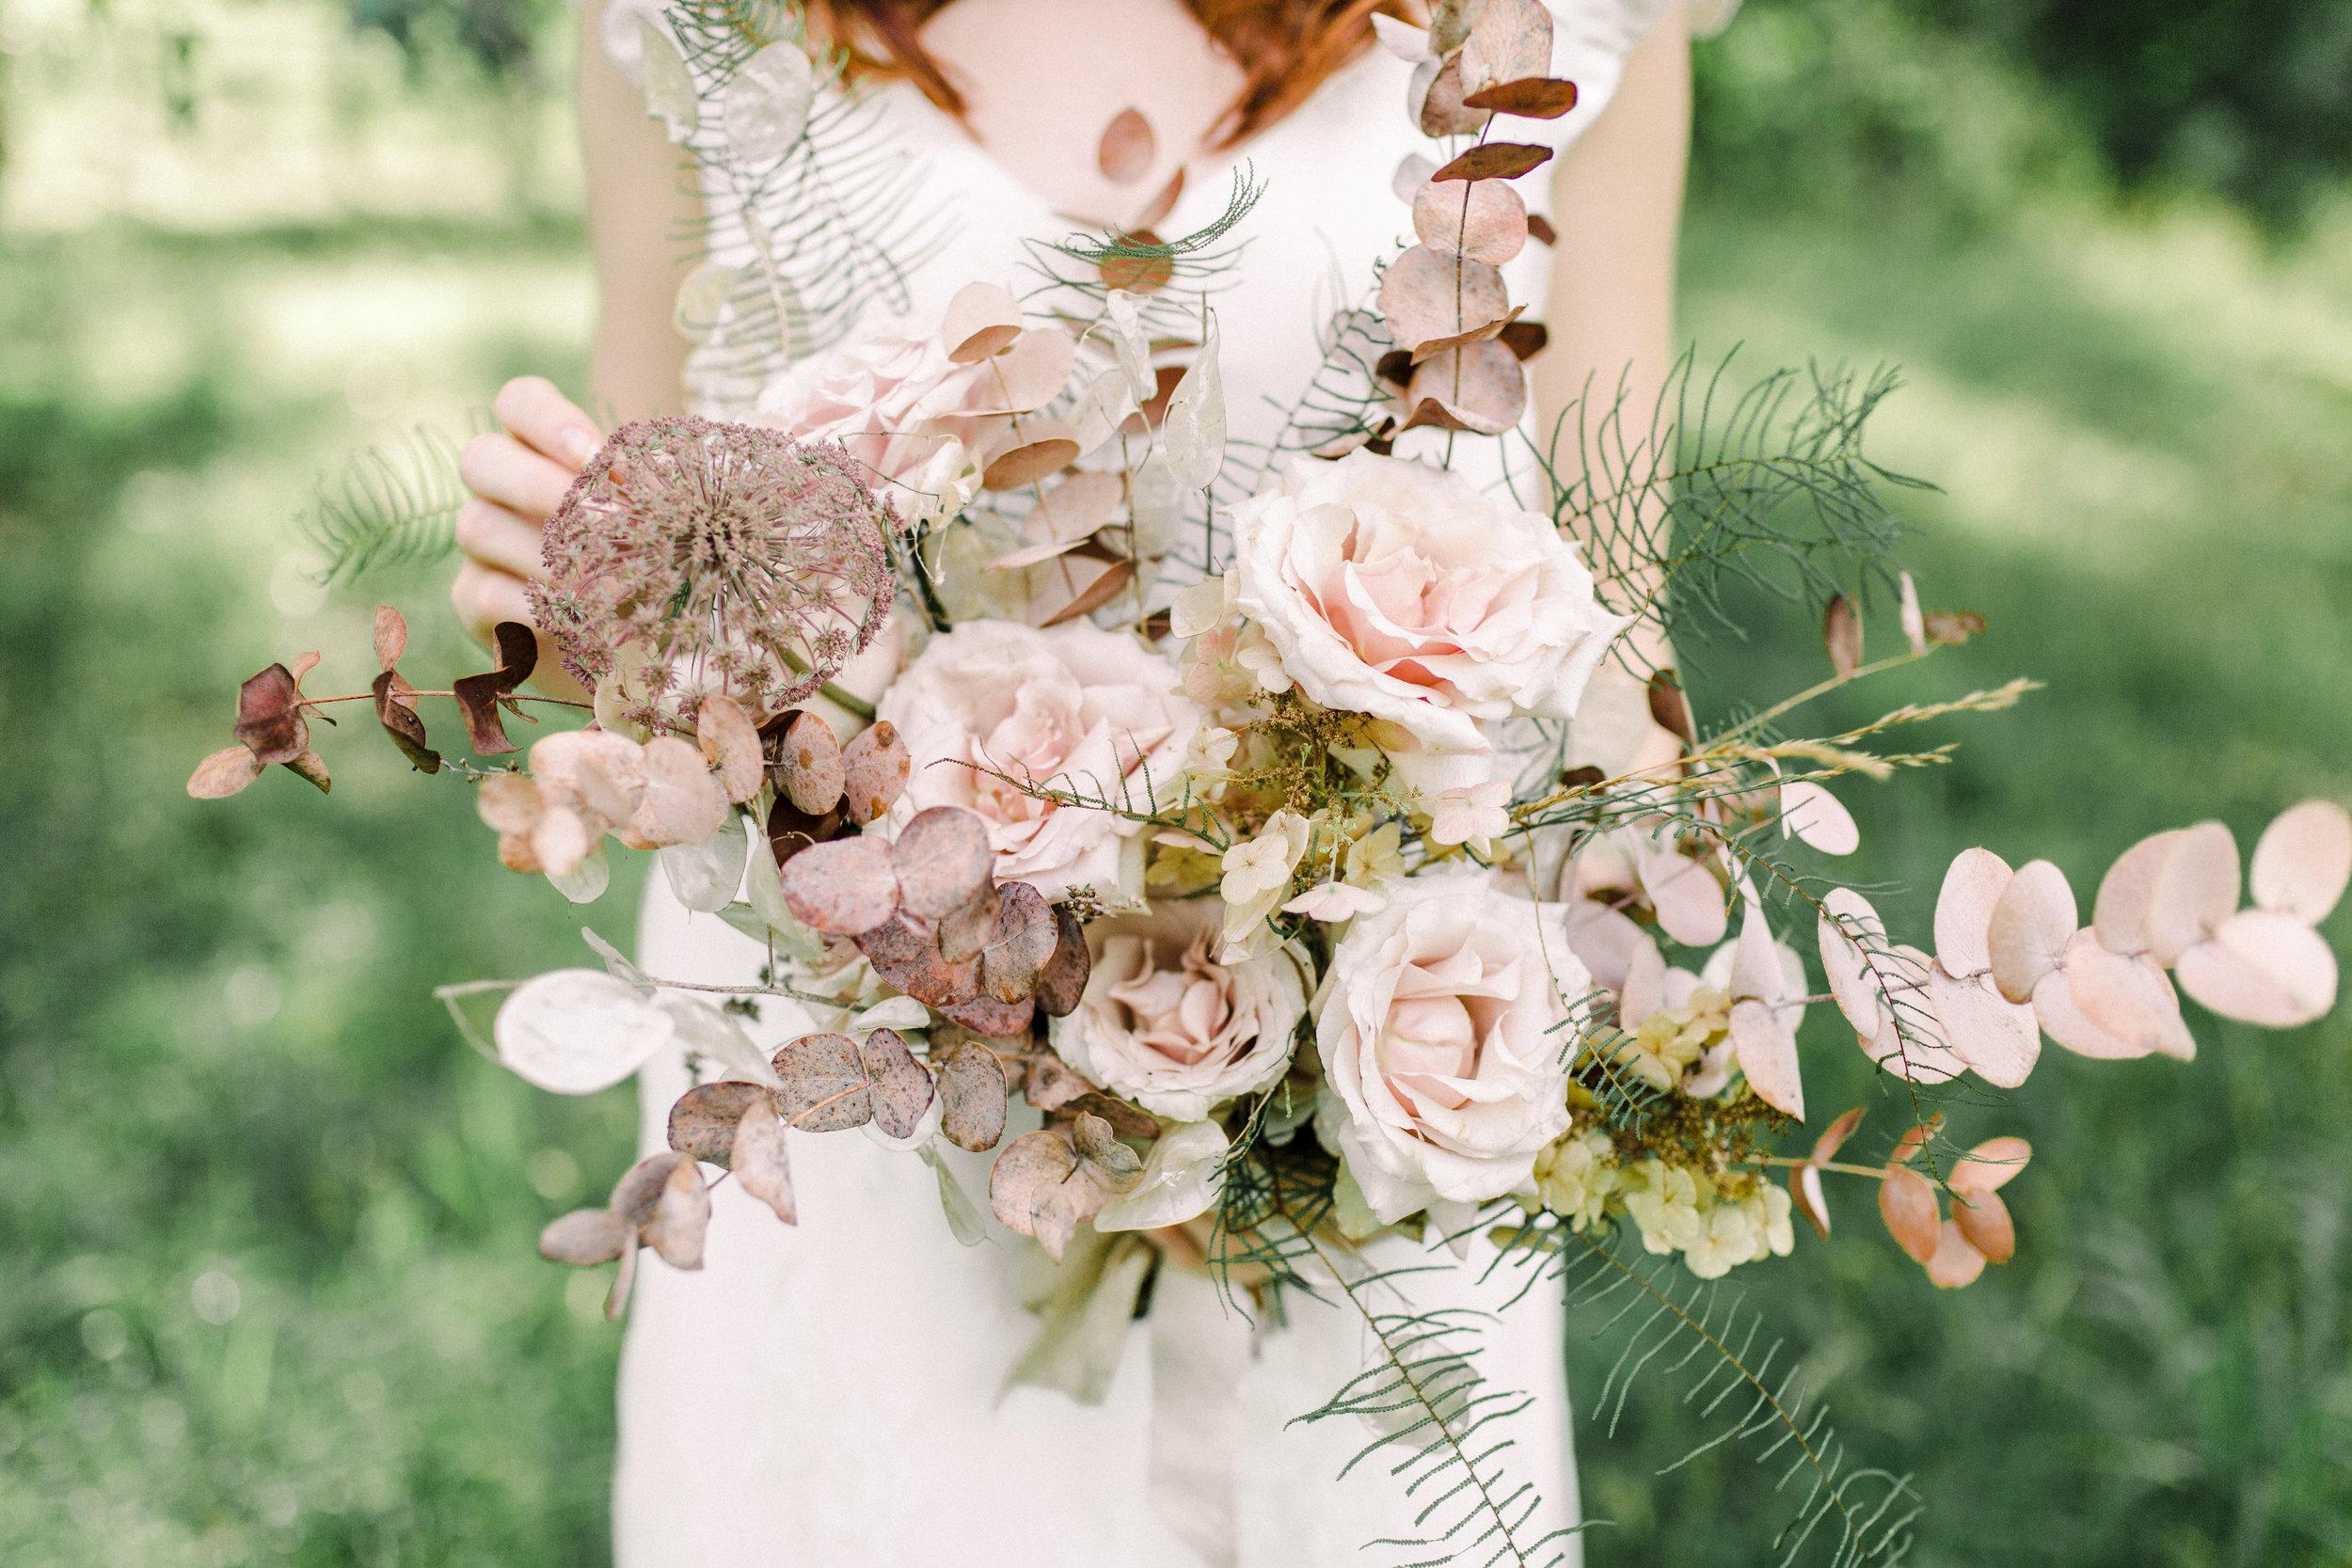 oxford-exchange-wedding-photos-carography-studios-I58A6709.jpg